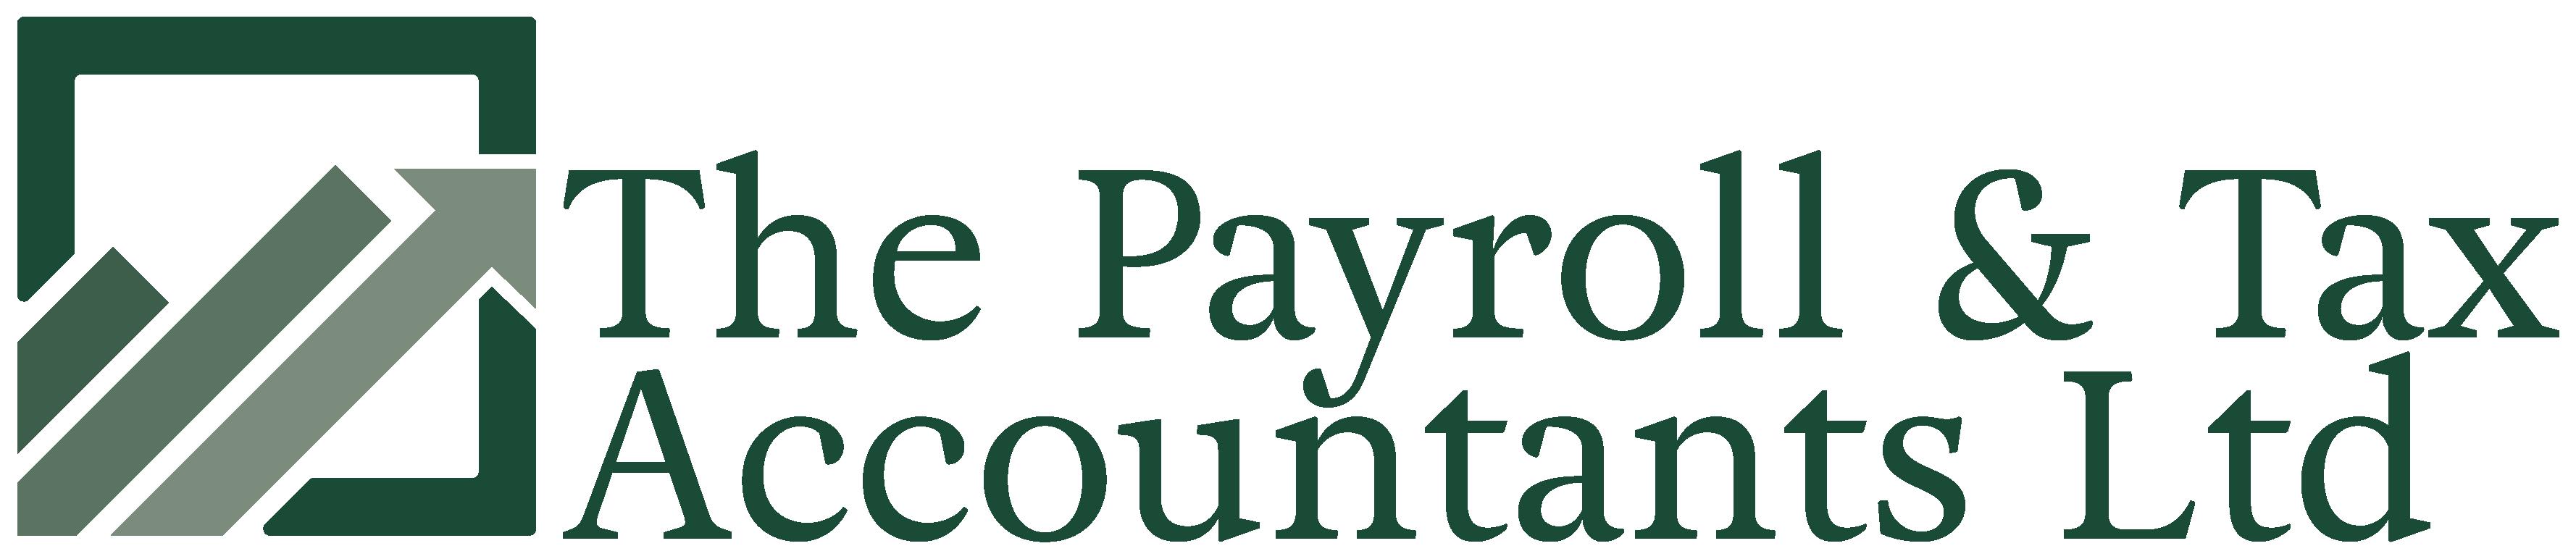 The Payroll & Tax Accountants Ltd